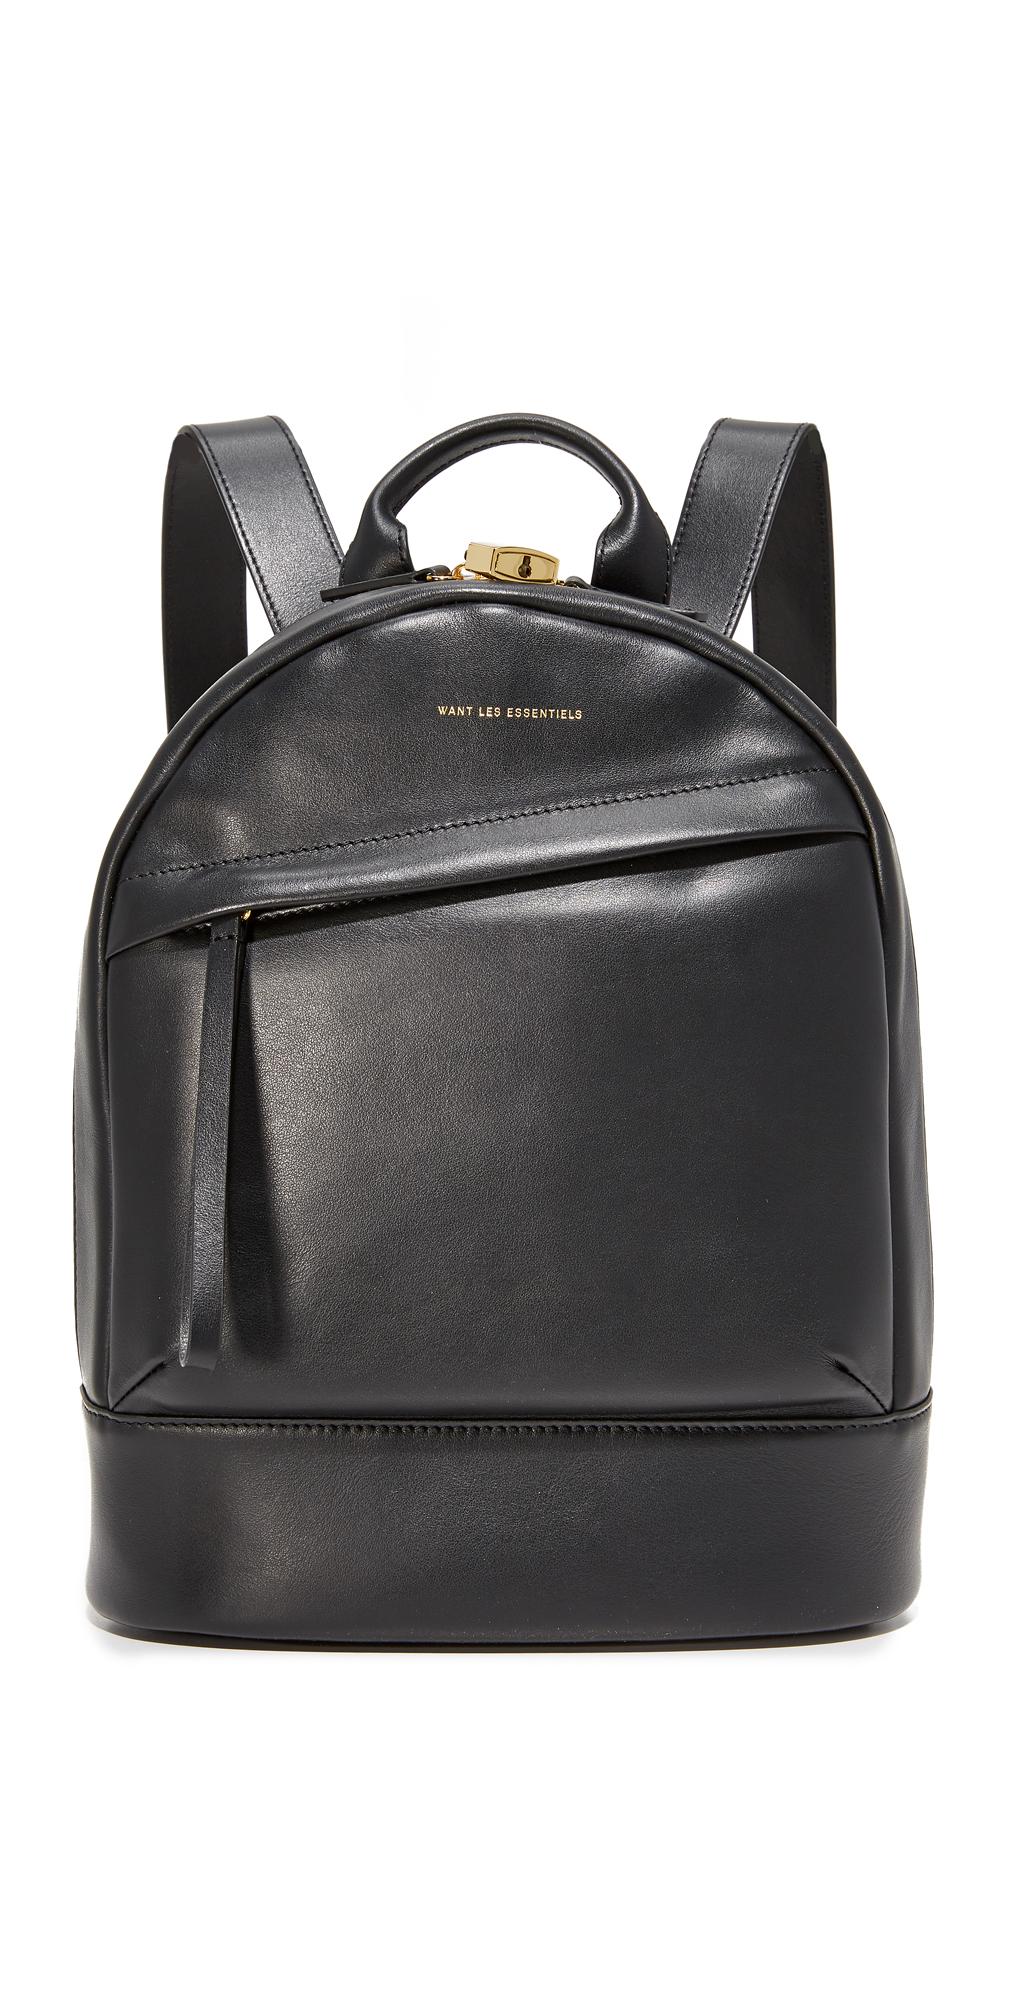 Mini Piper Backpack WANT LES ESSENTIELS